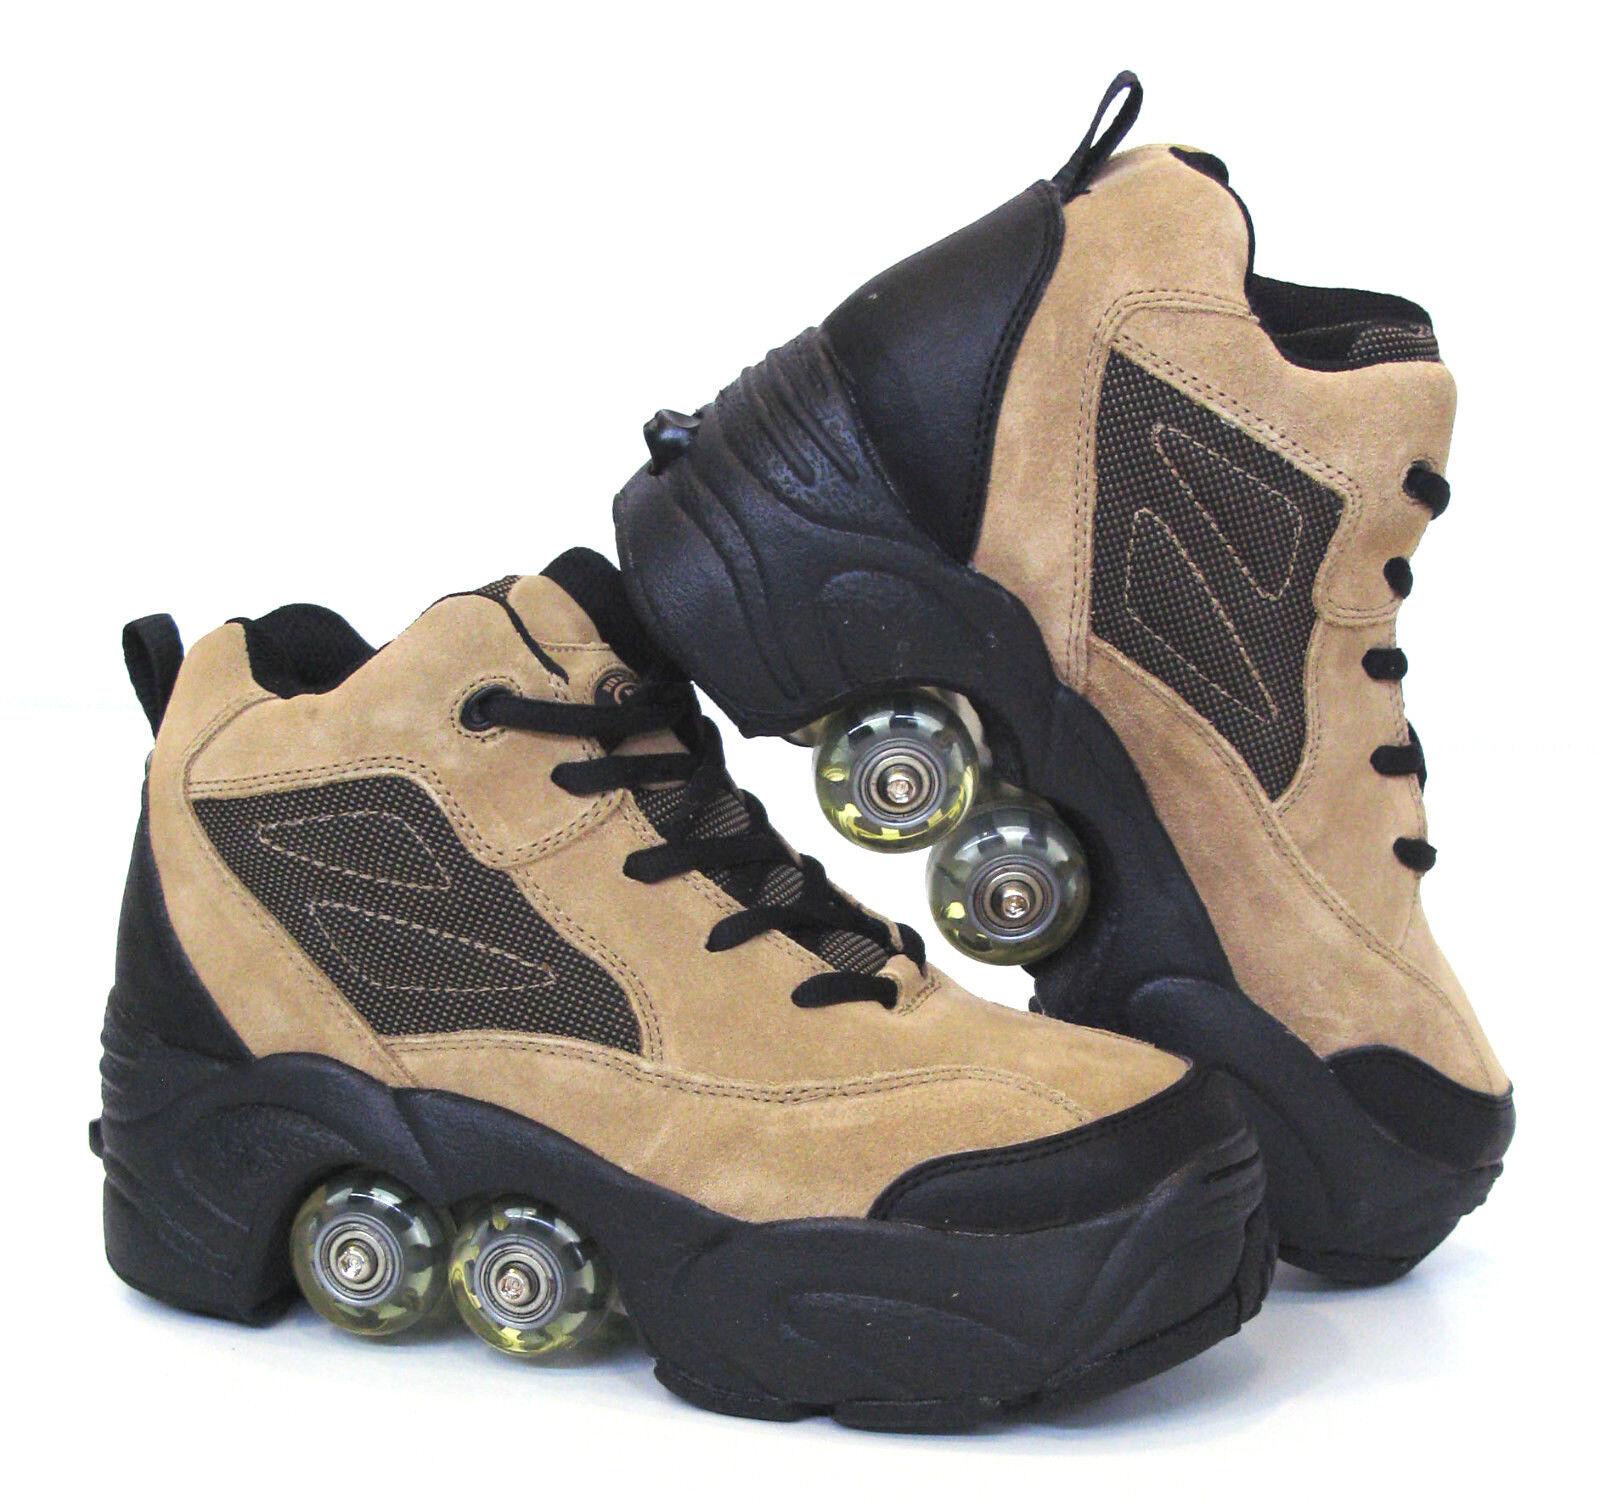 kick roller skate shoes amazon